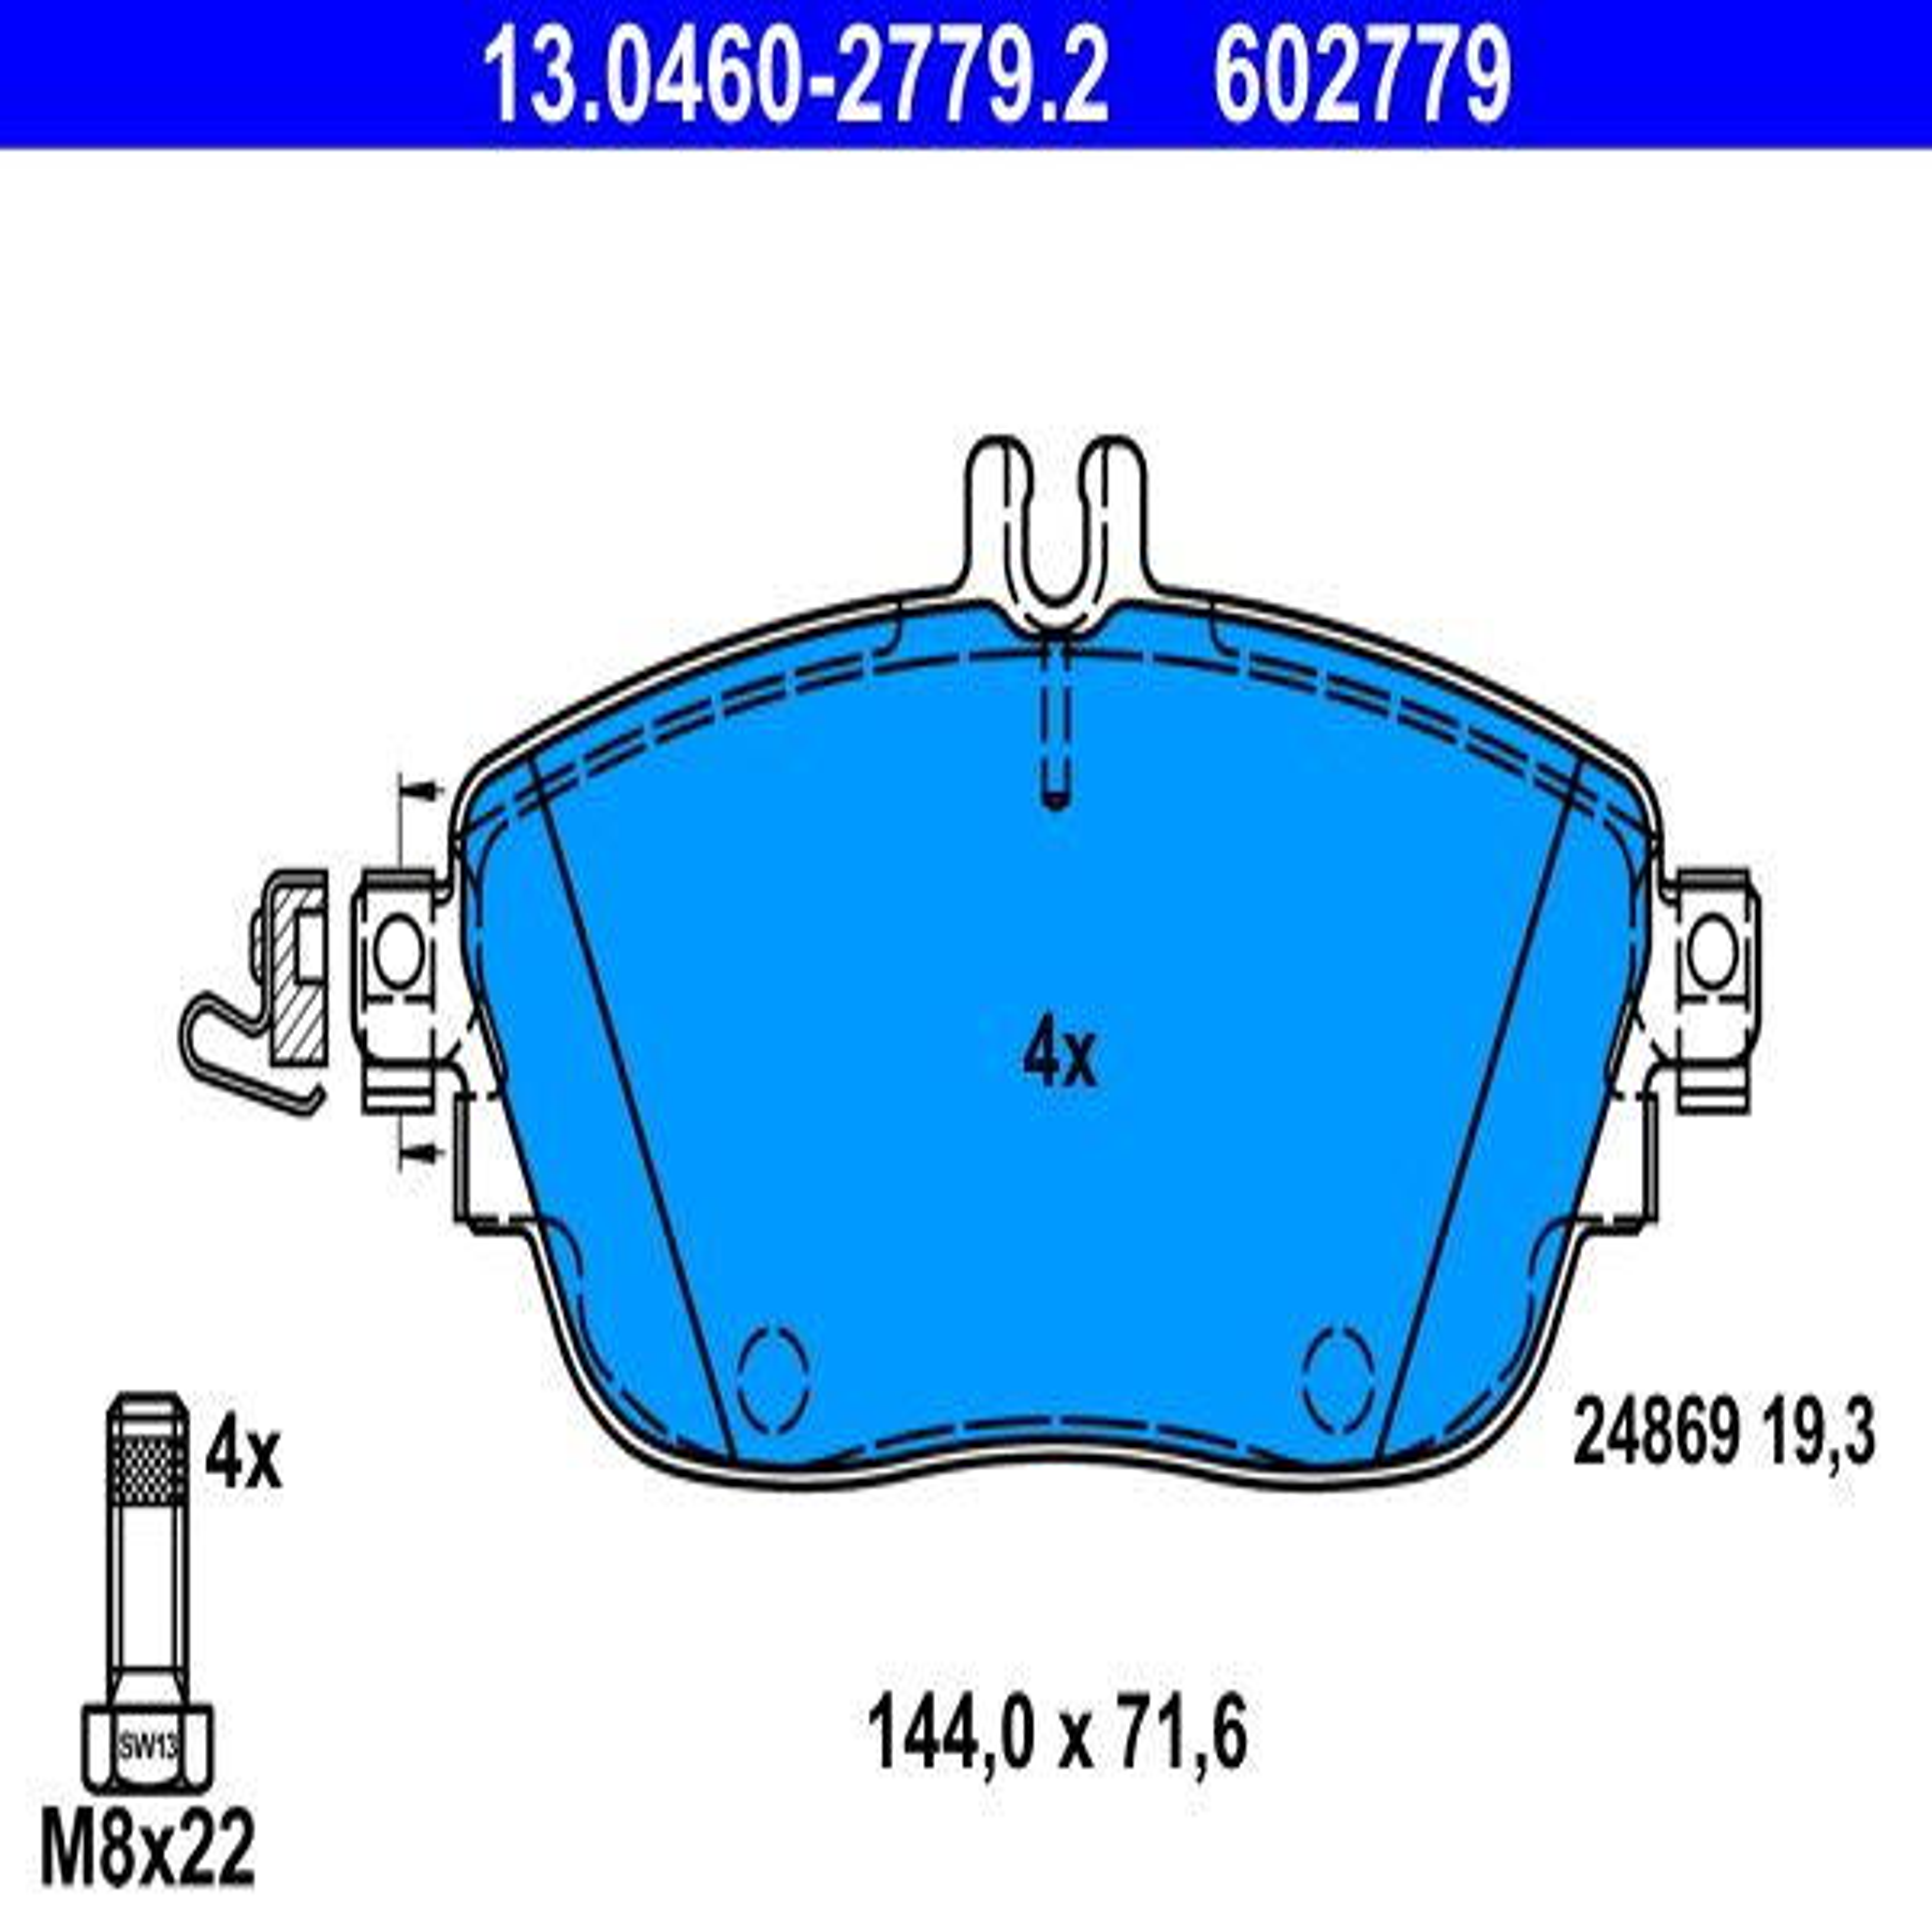 ATE: Original Bremsklötze 13.0460-2779.2 (Höhe: 71,6mm, Breite: 144,0mm, Dicke/Stärke: 19,3mm)